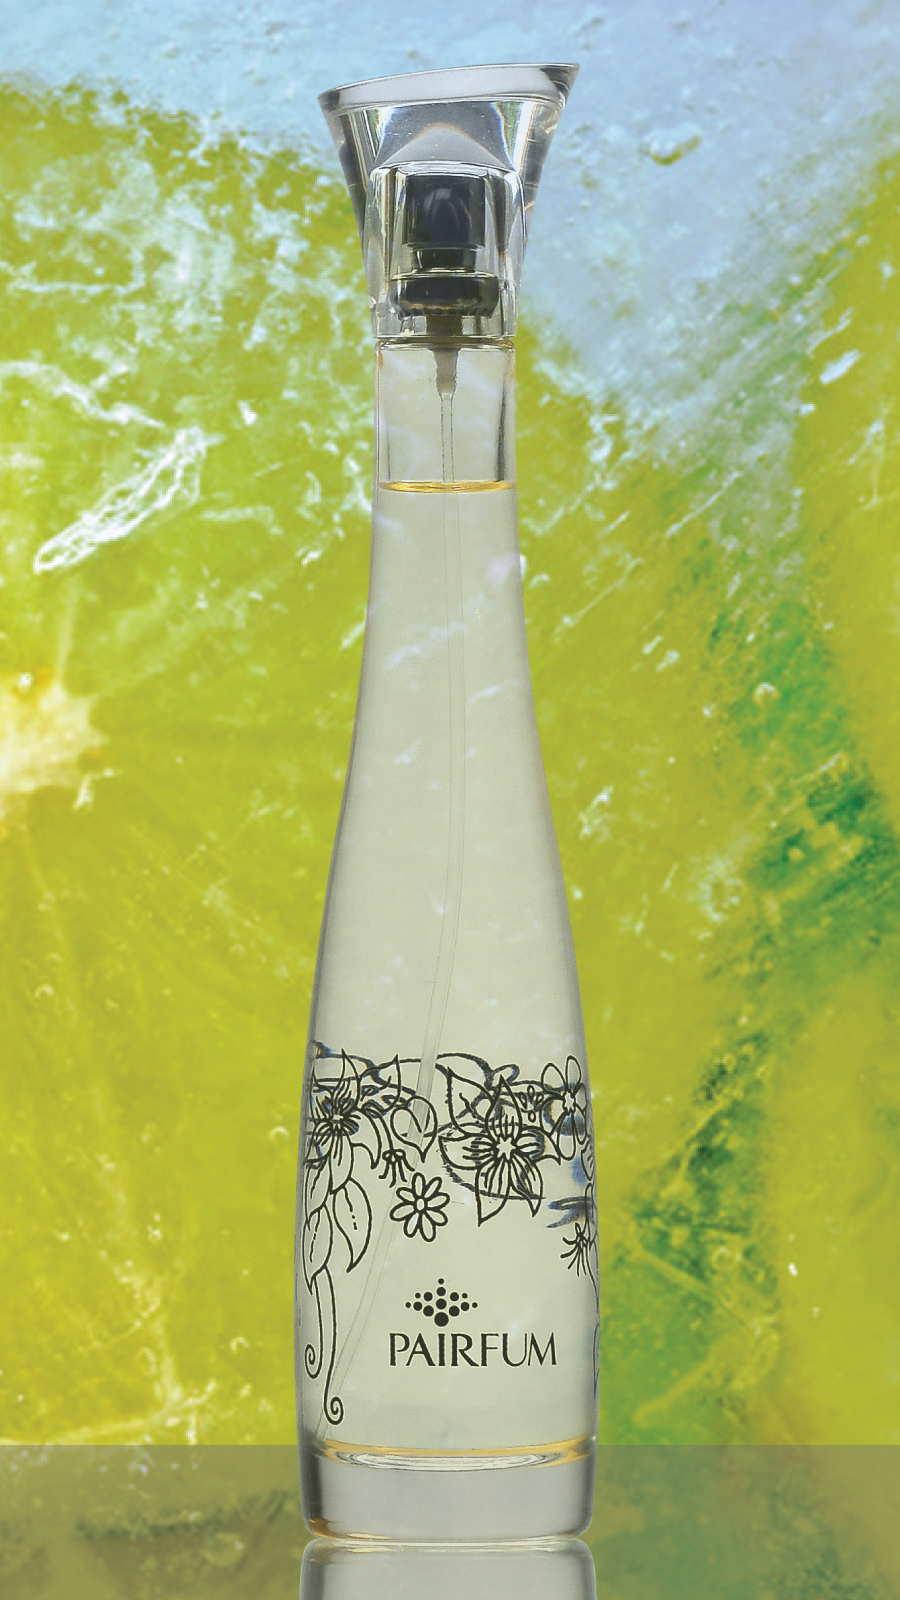 Flacon Room Fragrance Spray Citrus Aqua 9 16